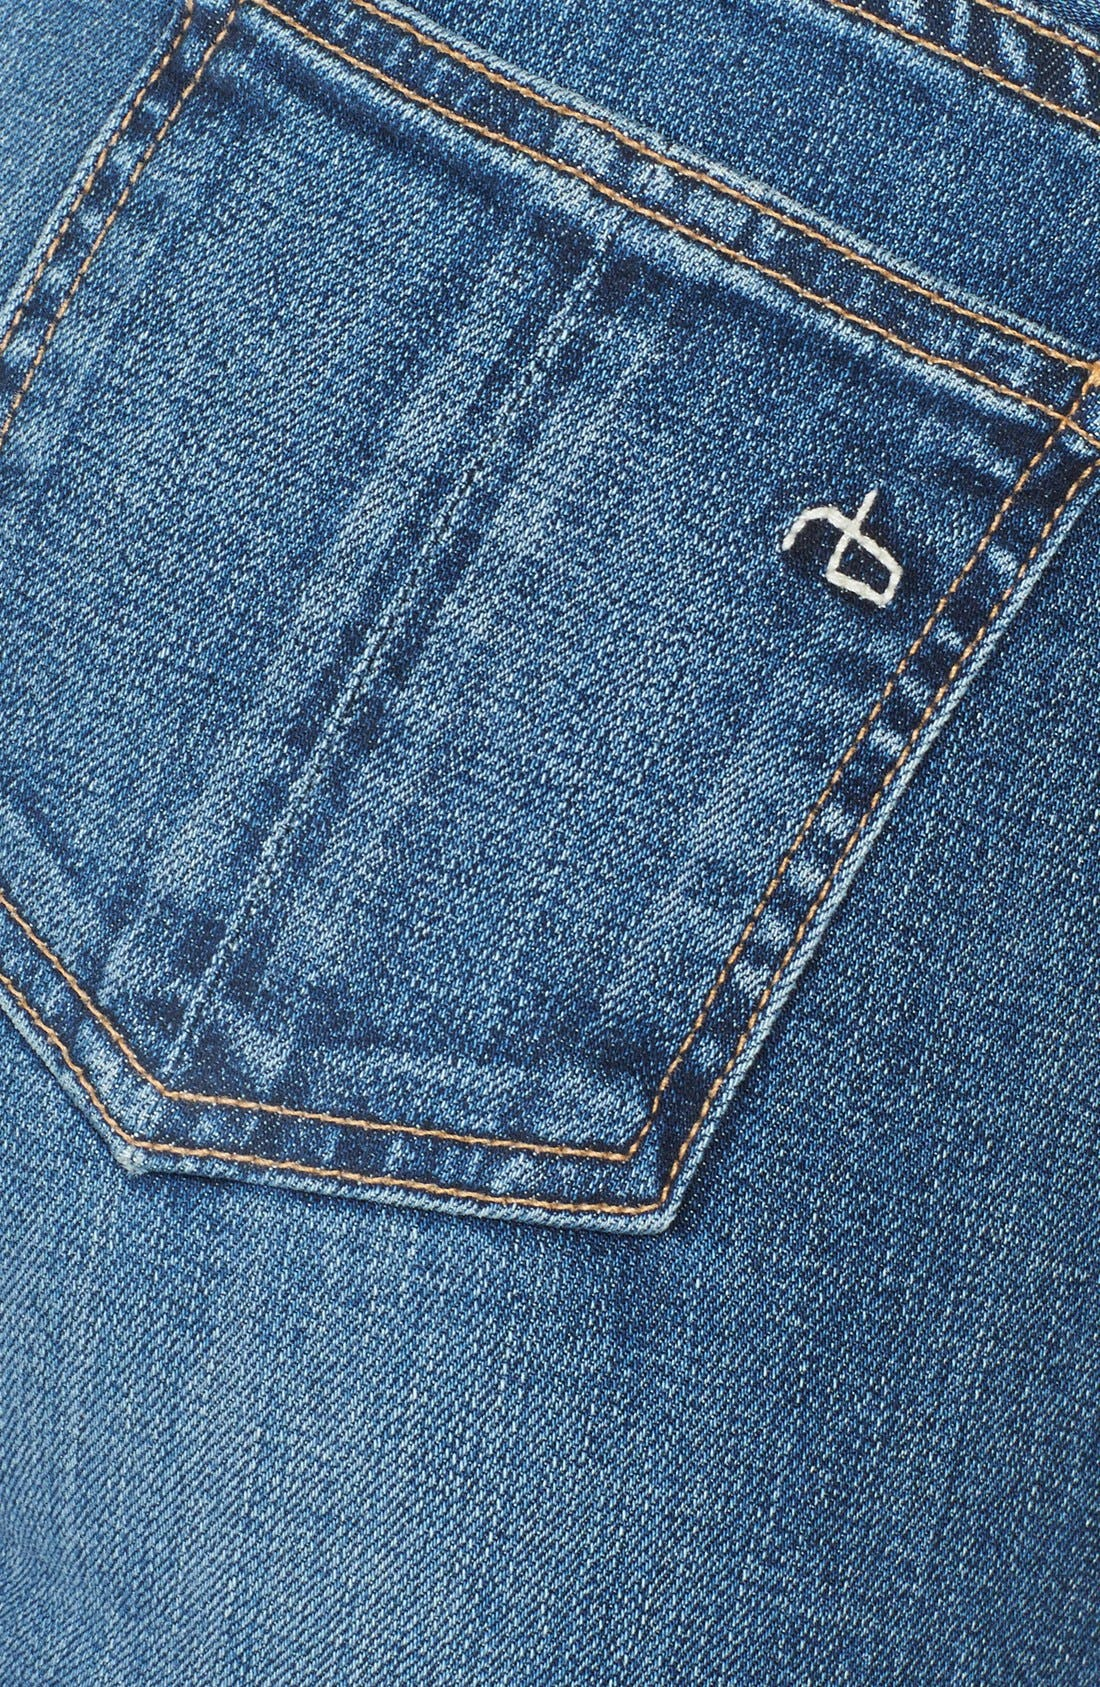 Alternate Image 3  - rag & bone/JEAN Skinny Stretch Jeans (Sloane Plaid Repair)